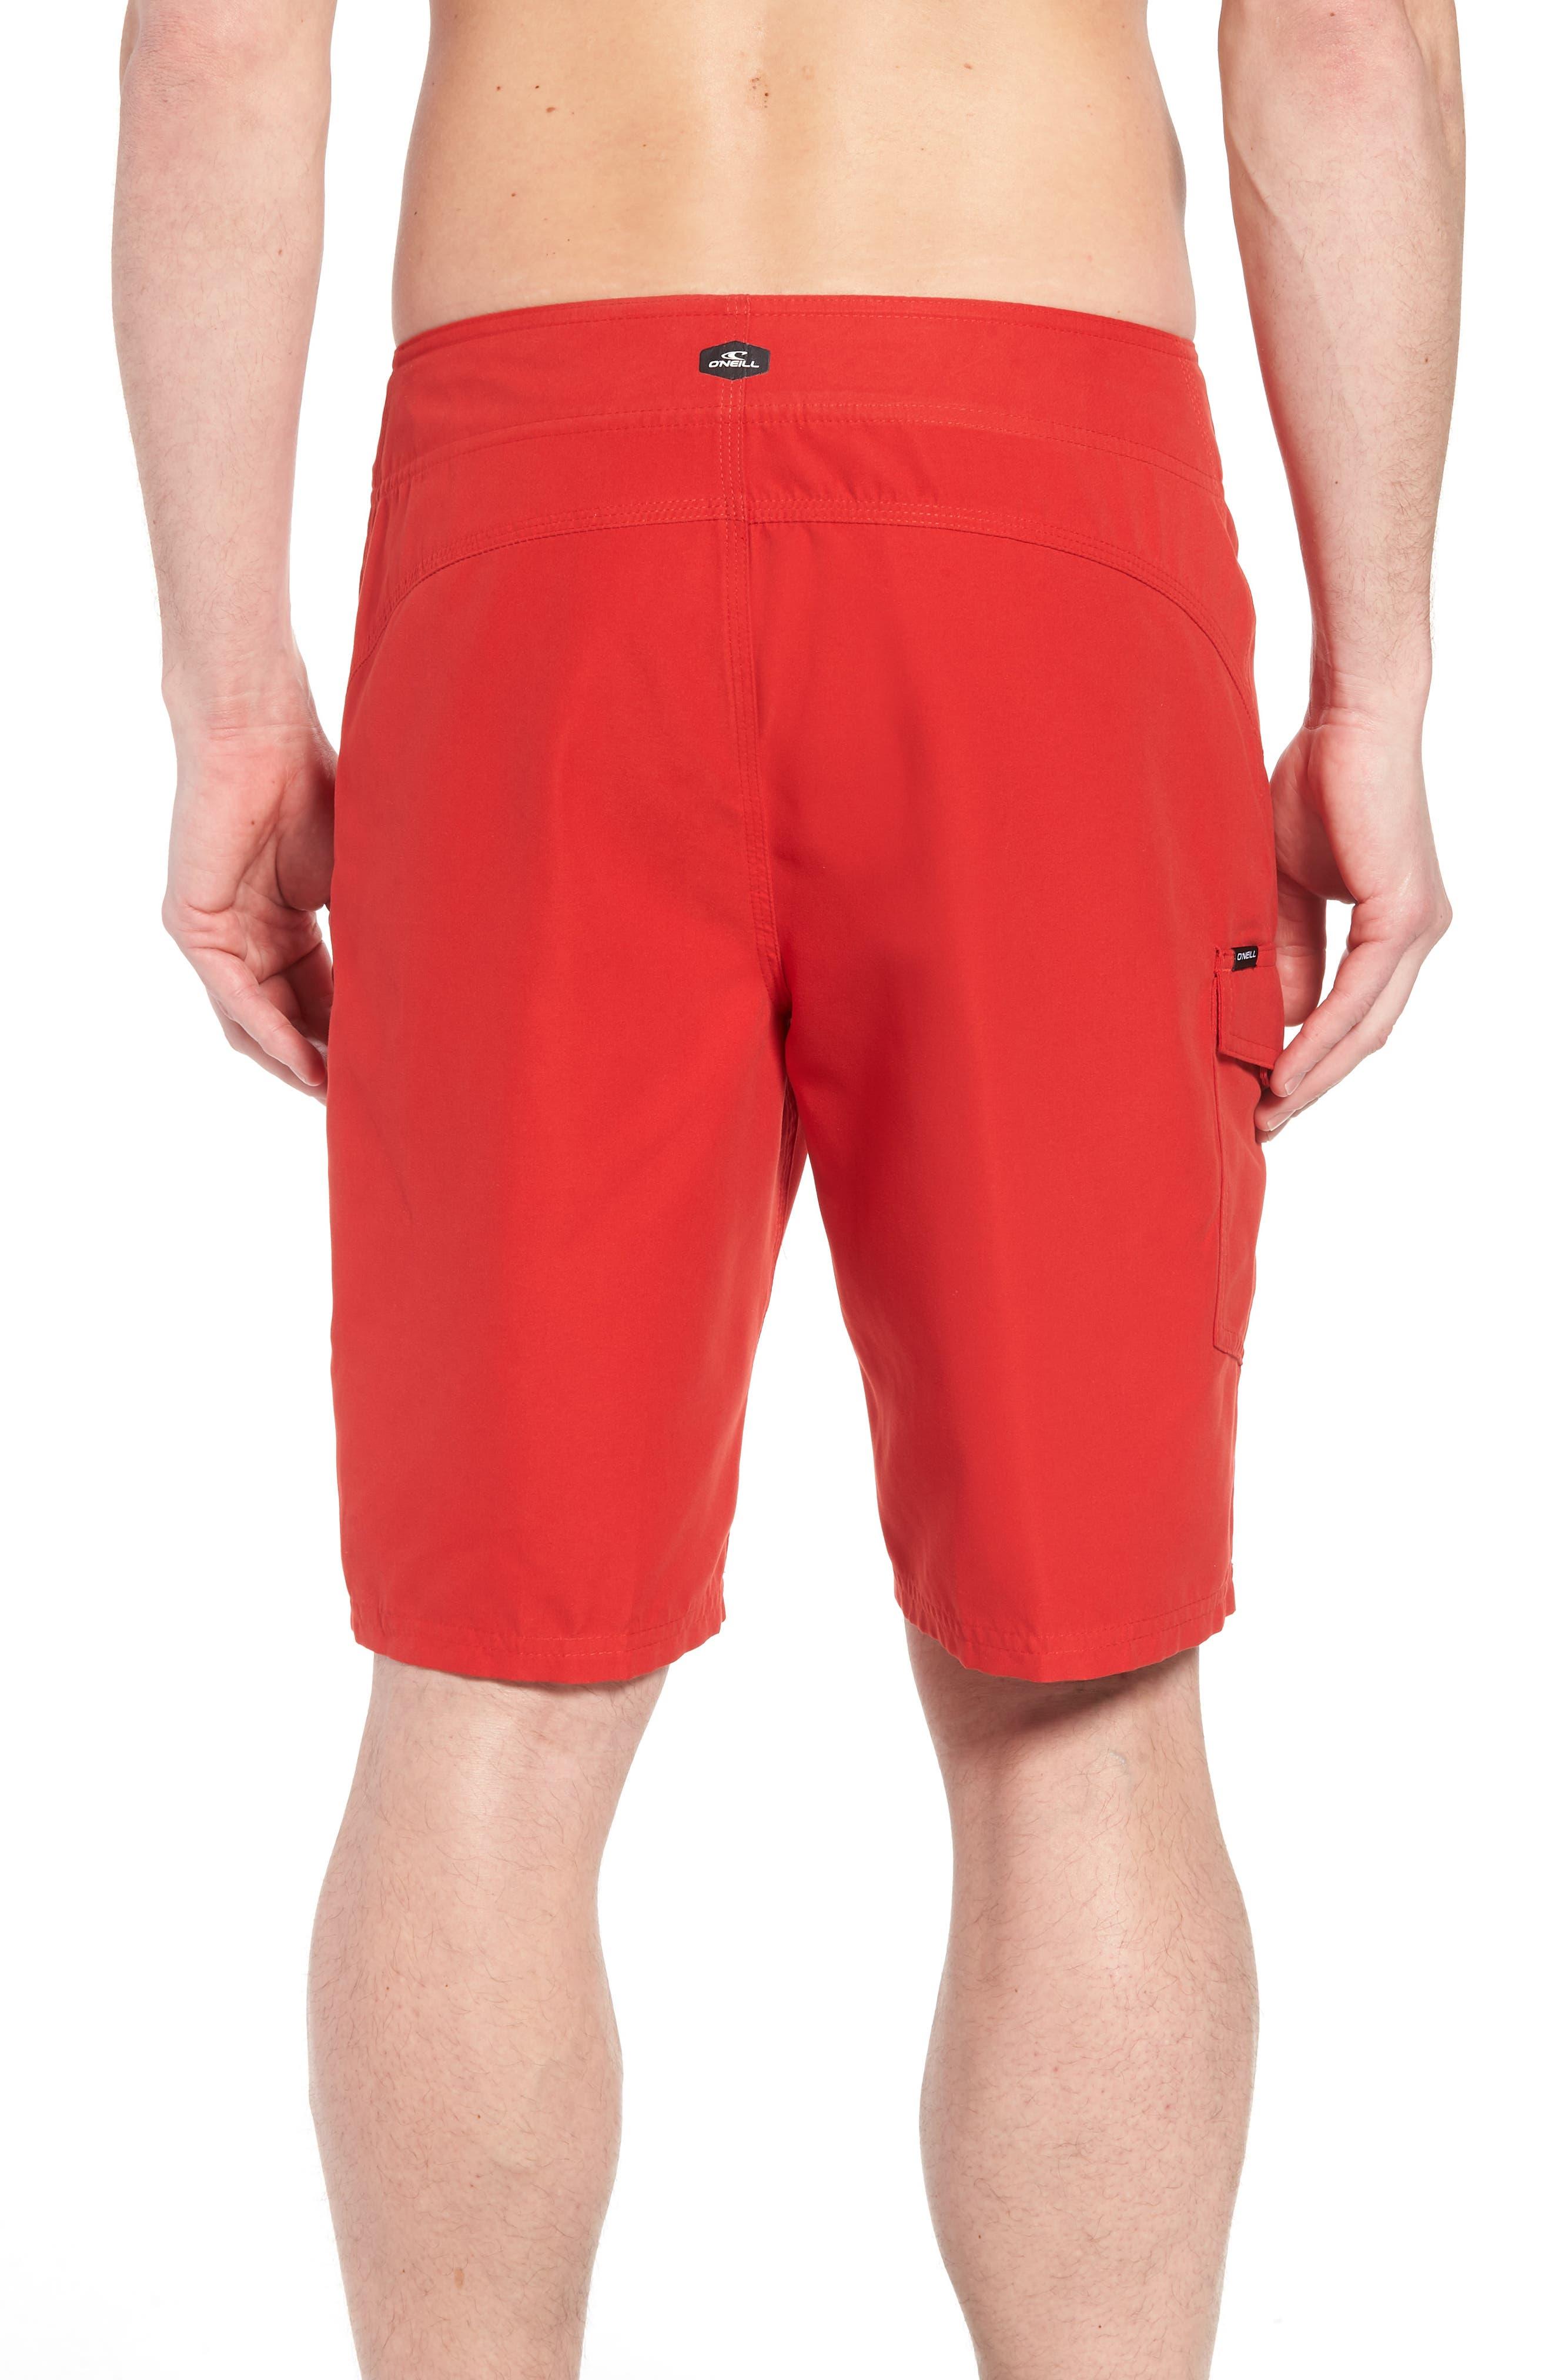 Santa Cruz Board Shorts,                             Alternate thumbnail 2, color,                             Red